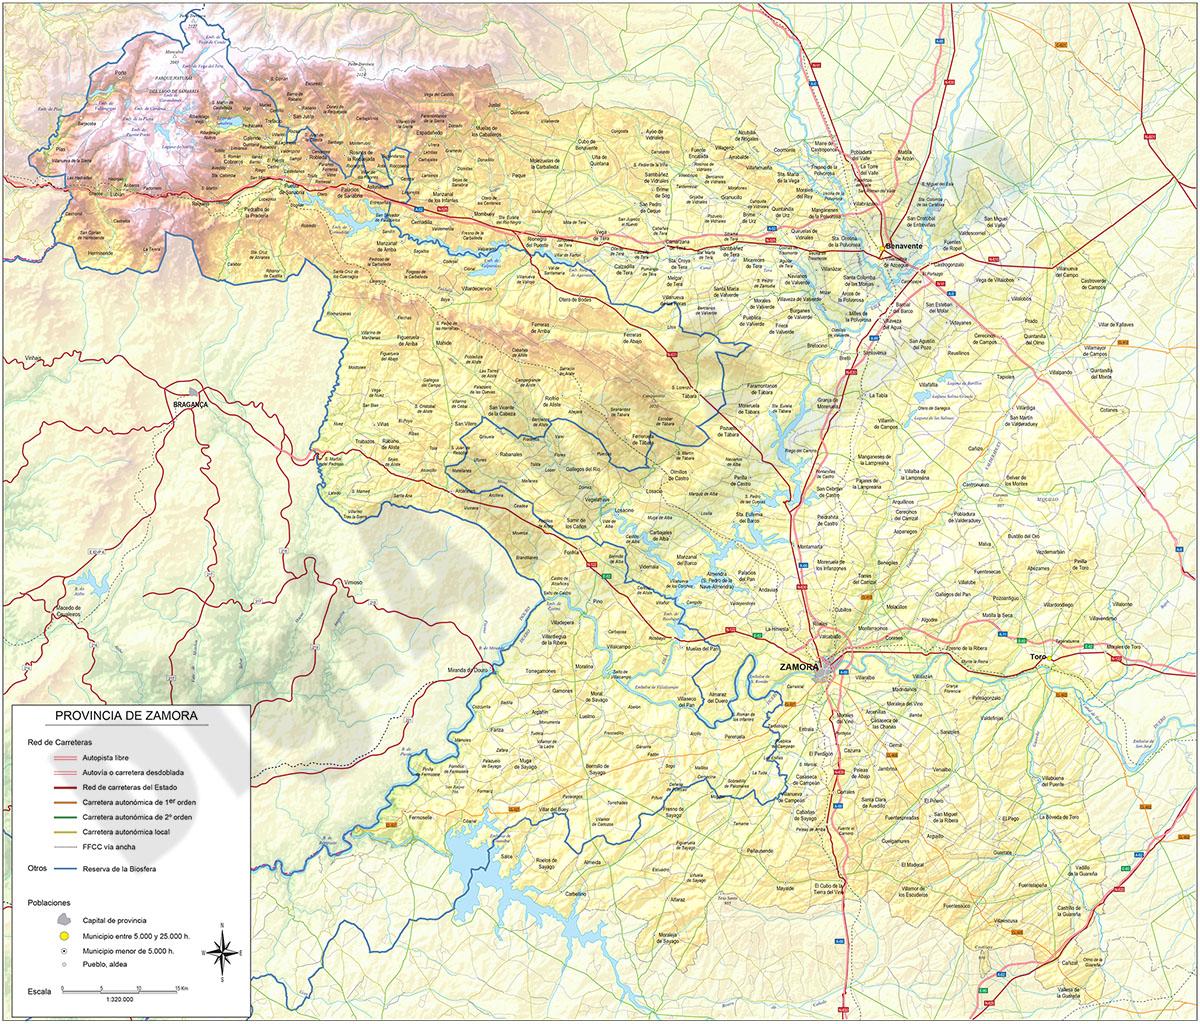 Map of Zamora